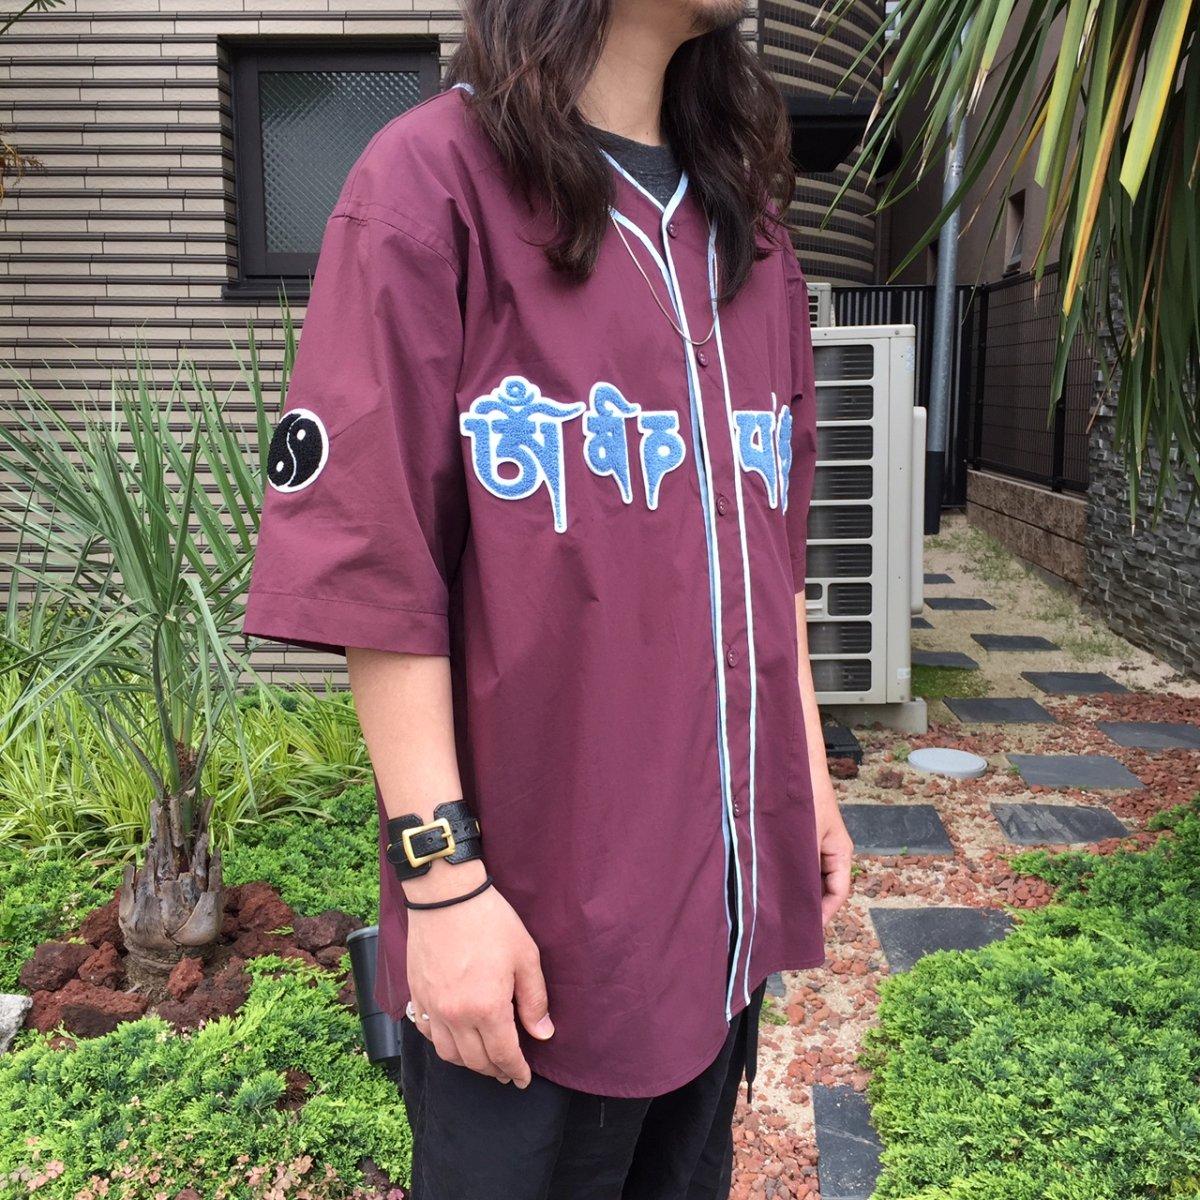 <img class='new_mark_img1' src='https://img.shop-pro.jp/img/new/icons3.gif' style='border:none;display:inline;margin:0px;padding:0px;width:auto;' />Black weirdos  ブラック ウィドー / シャツ Mantra Baseball Shirt 【D・PURPLE】